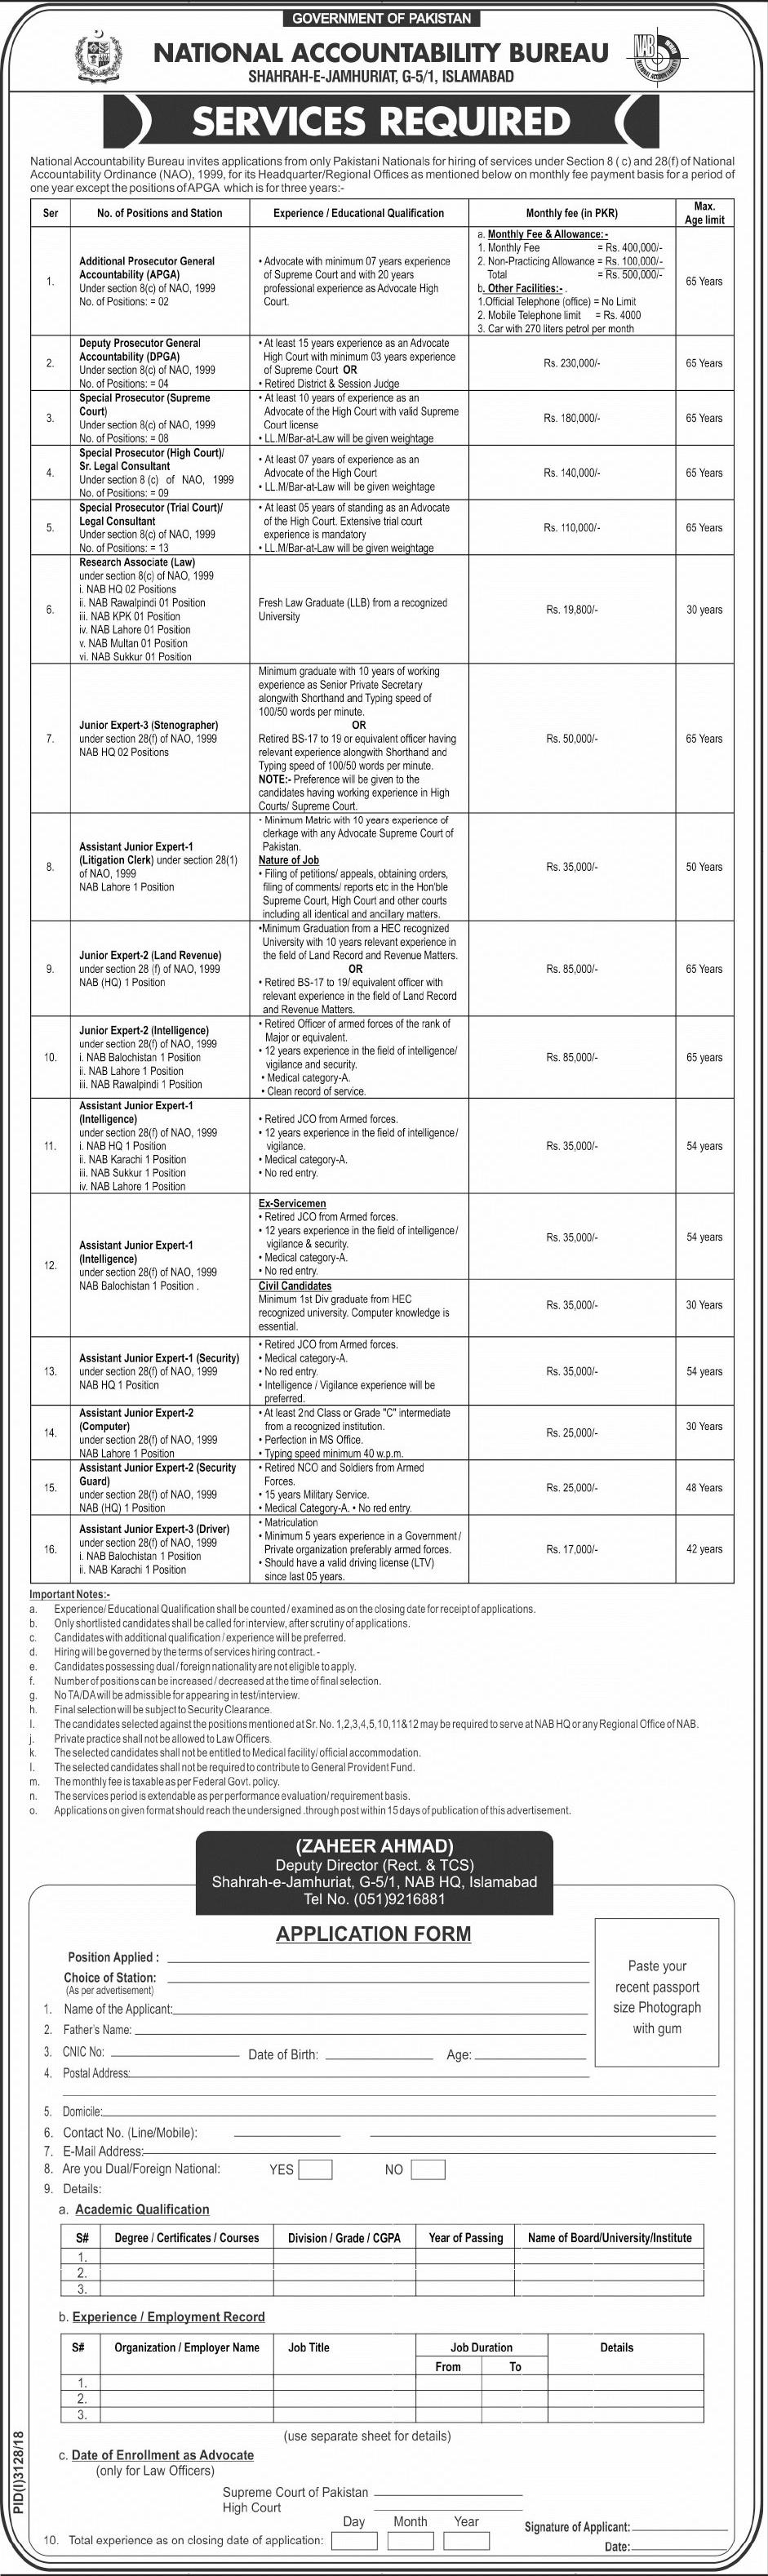 NAB Jobs 2019 National Accountability Bureau Application Form Last Date